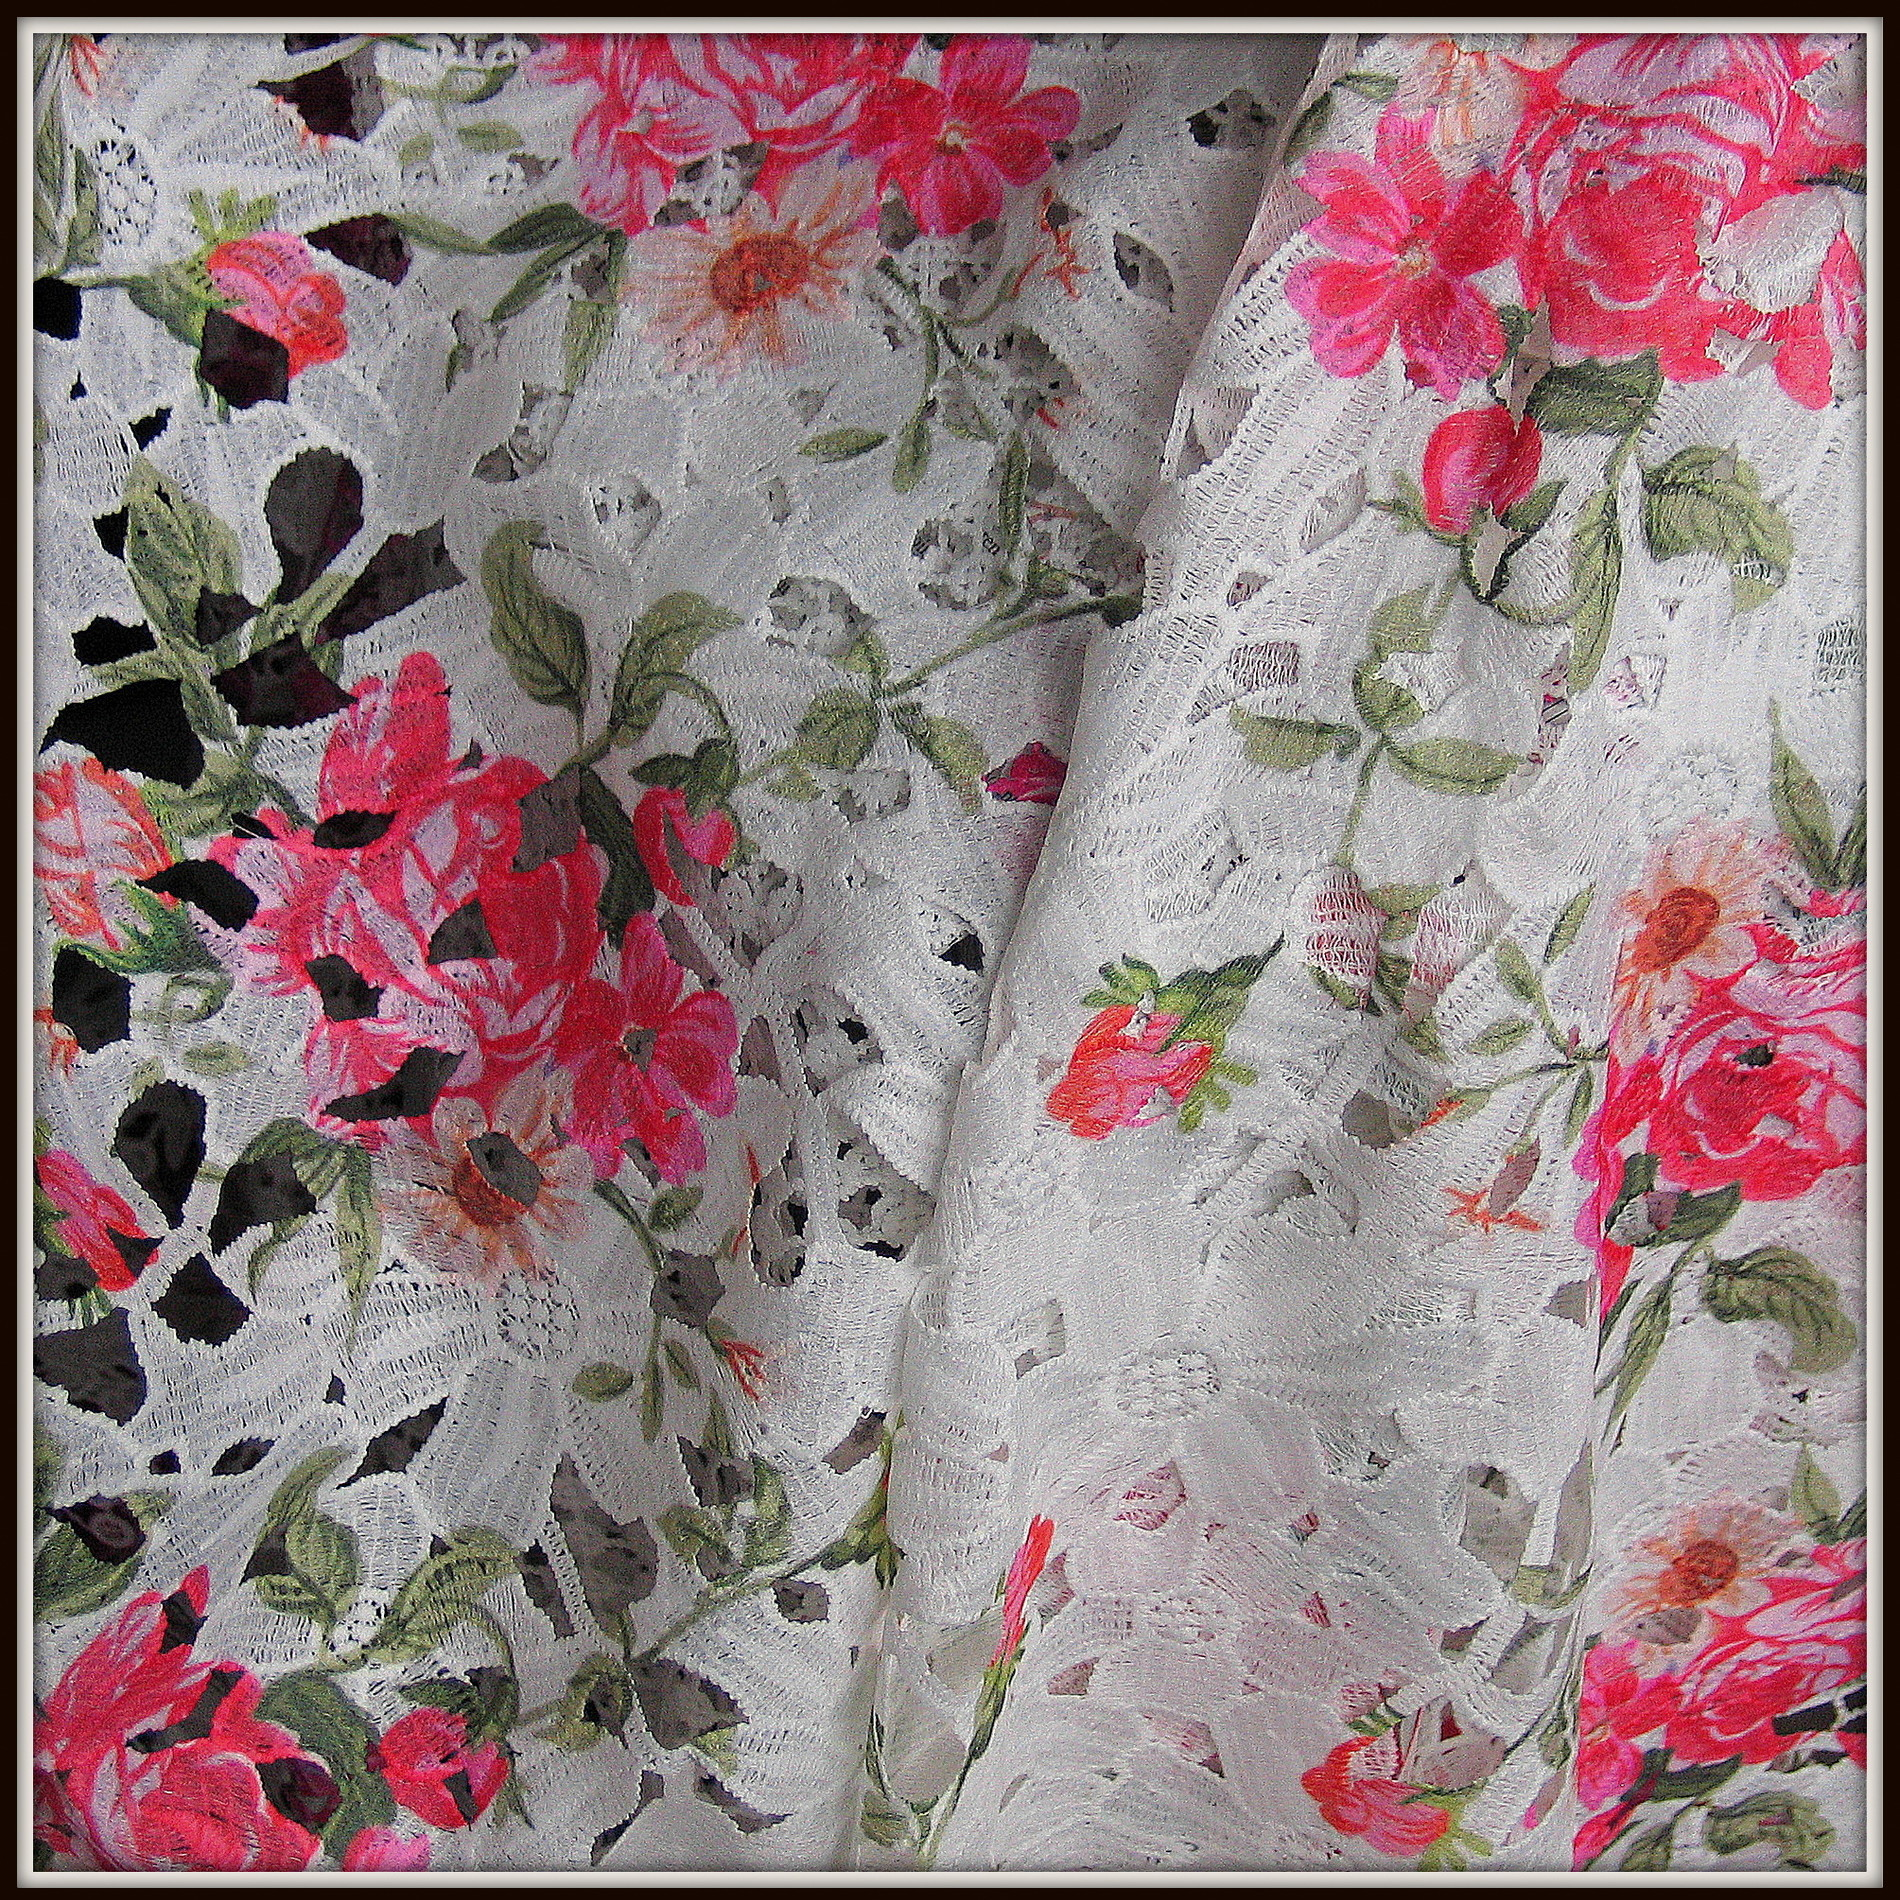 allover blumen spitze bedruckt mit rosen muster bestickte spitzen pailletten bestickte spitze. Black Bedroom Furniture Sets. Home Design Ideas